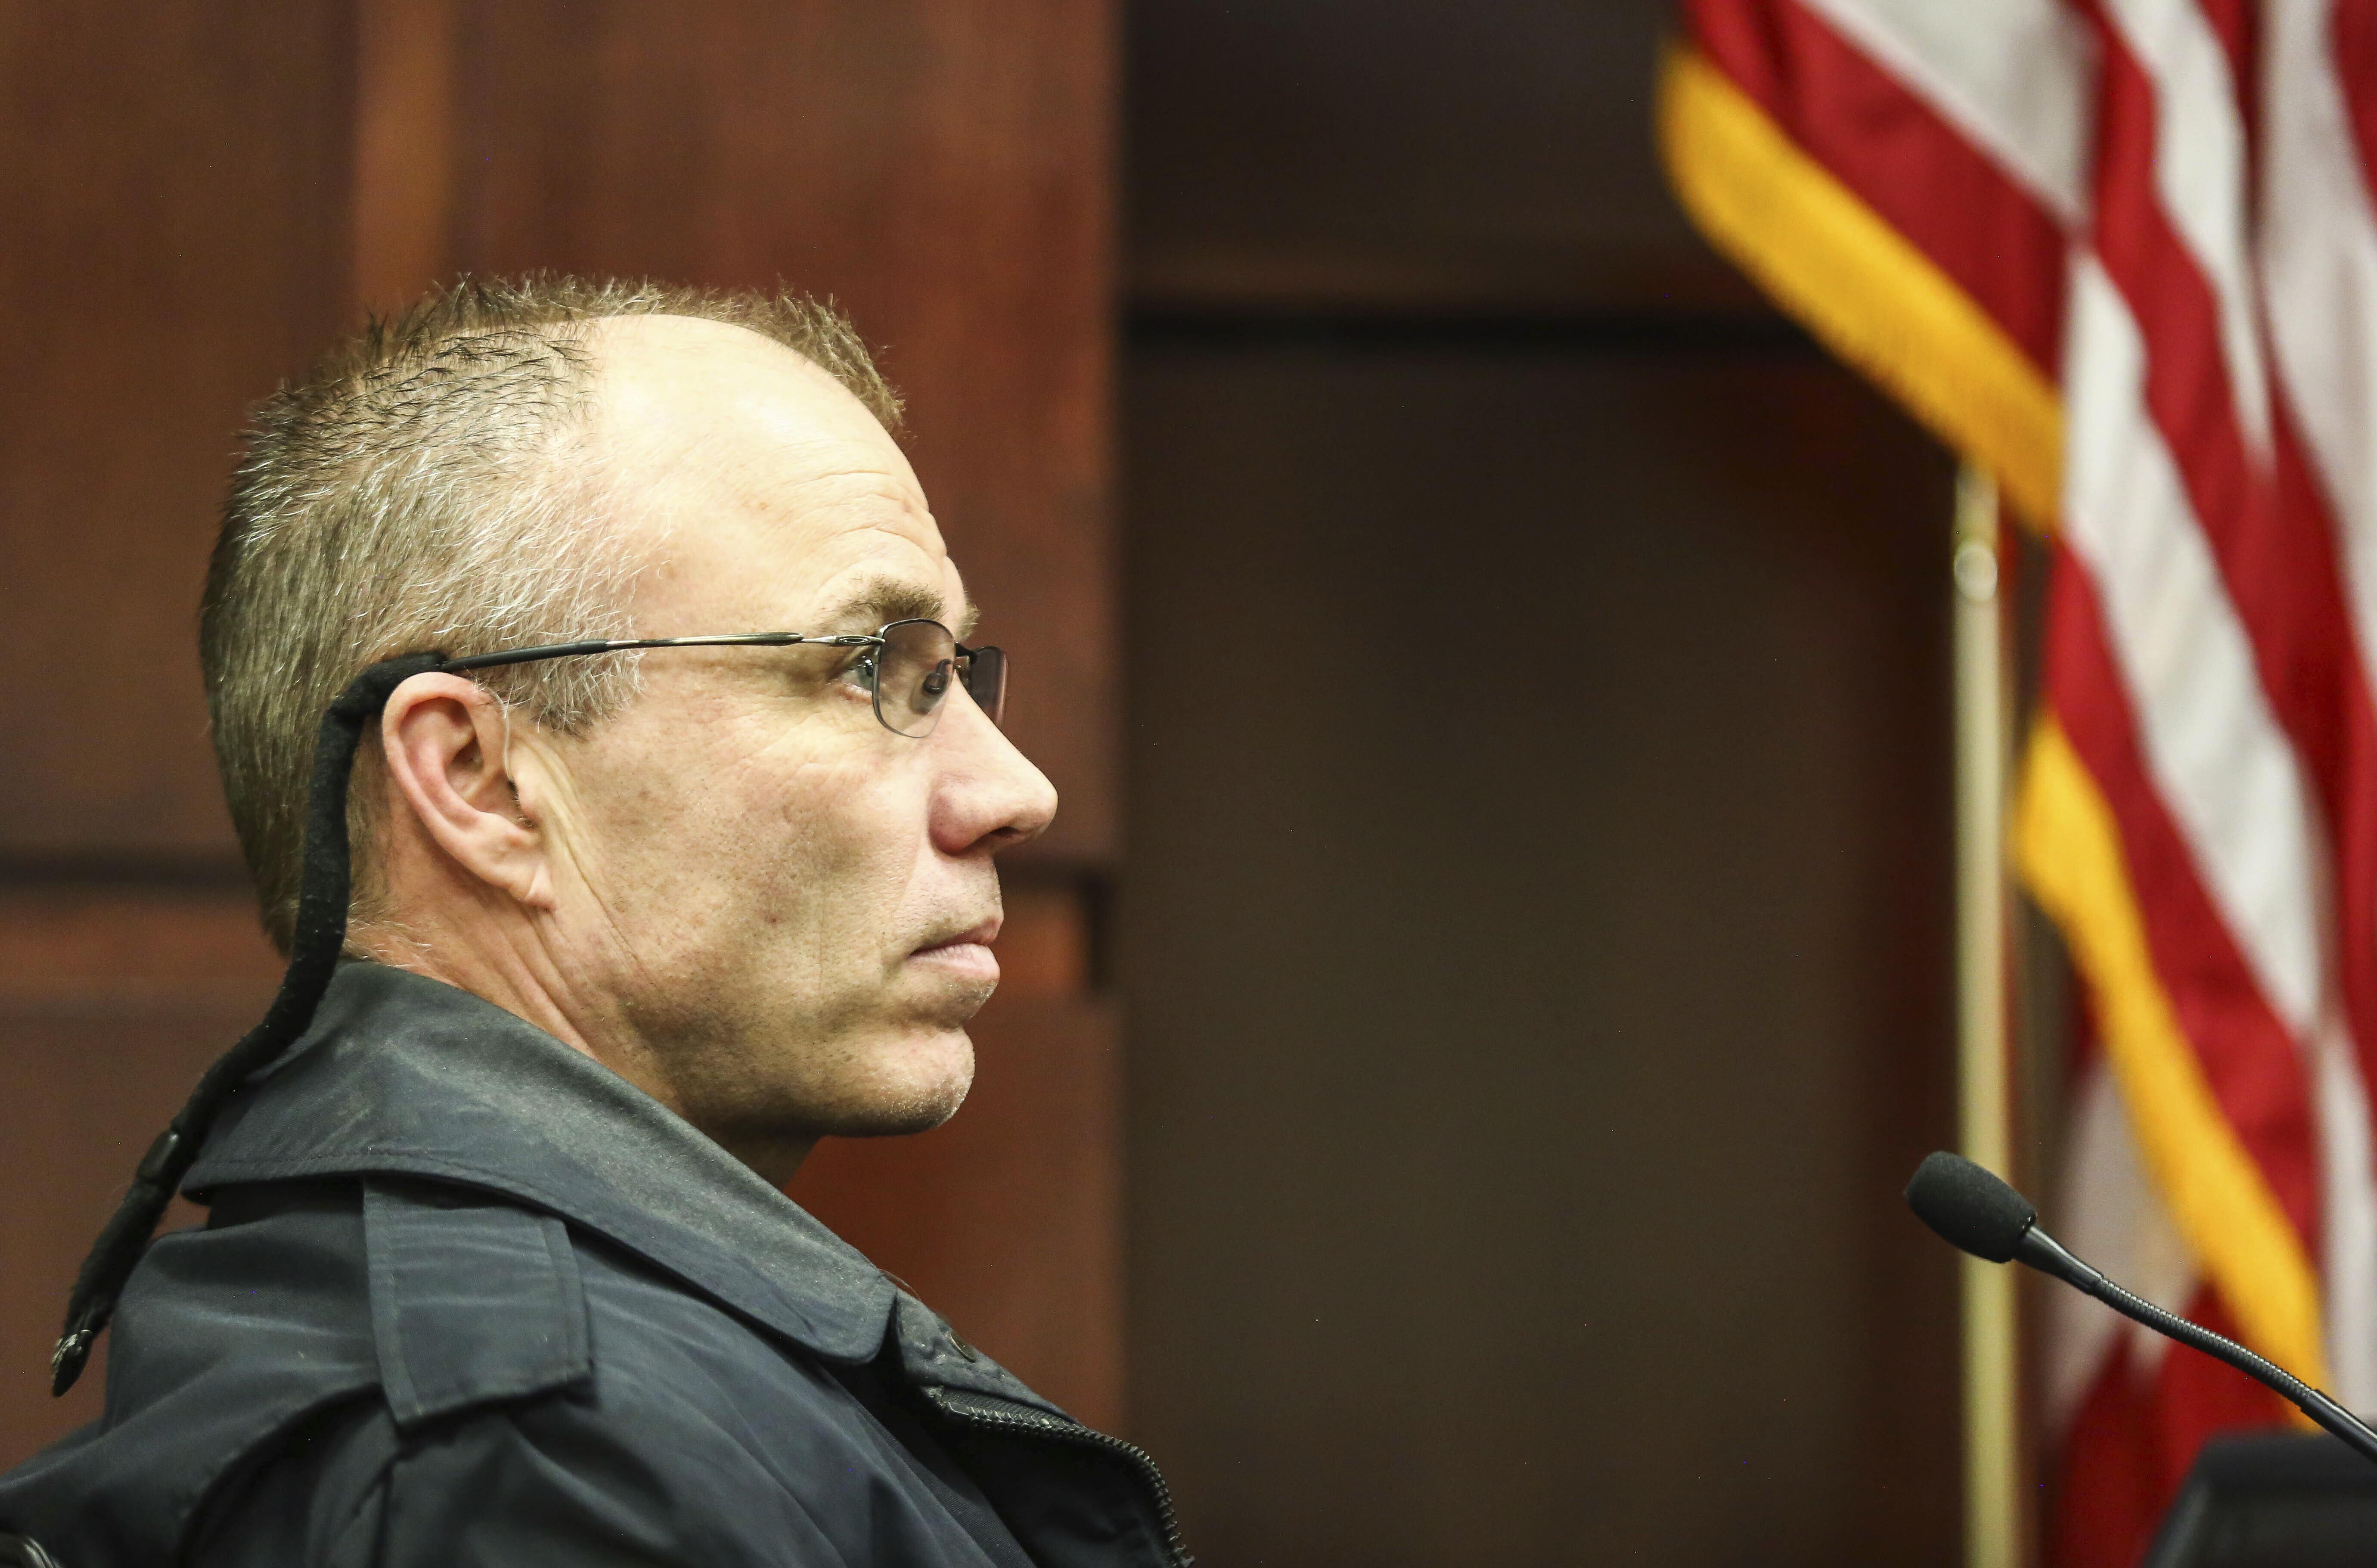 Officer on leave after apparent Klan document seen at home